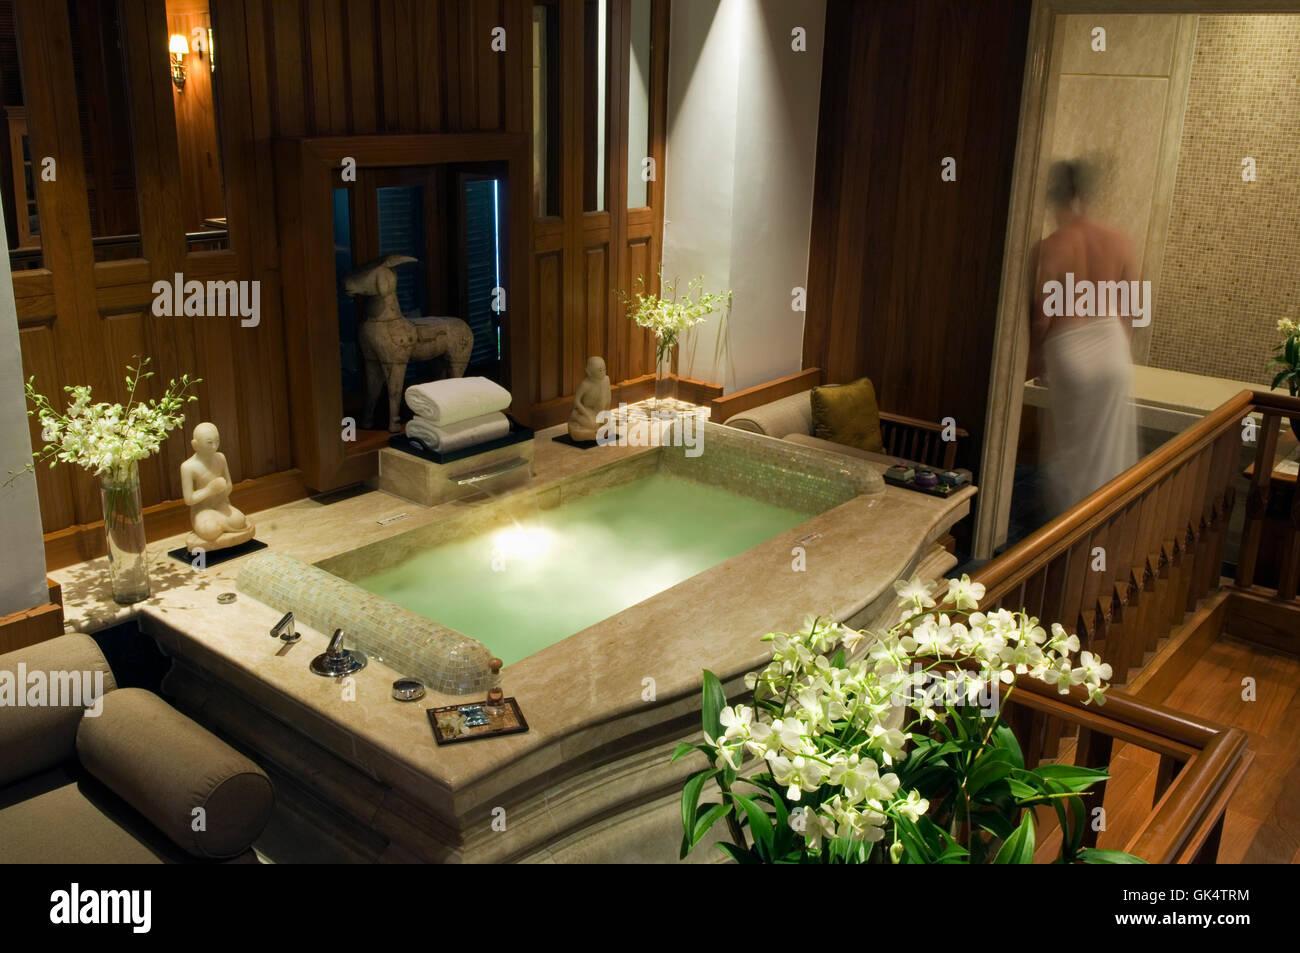 Thailand Luxury Bathtub Oriental Stock Photos & Thailand Luxury ...